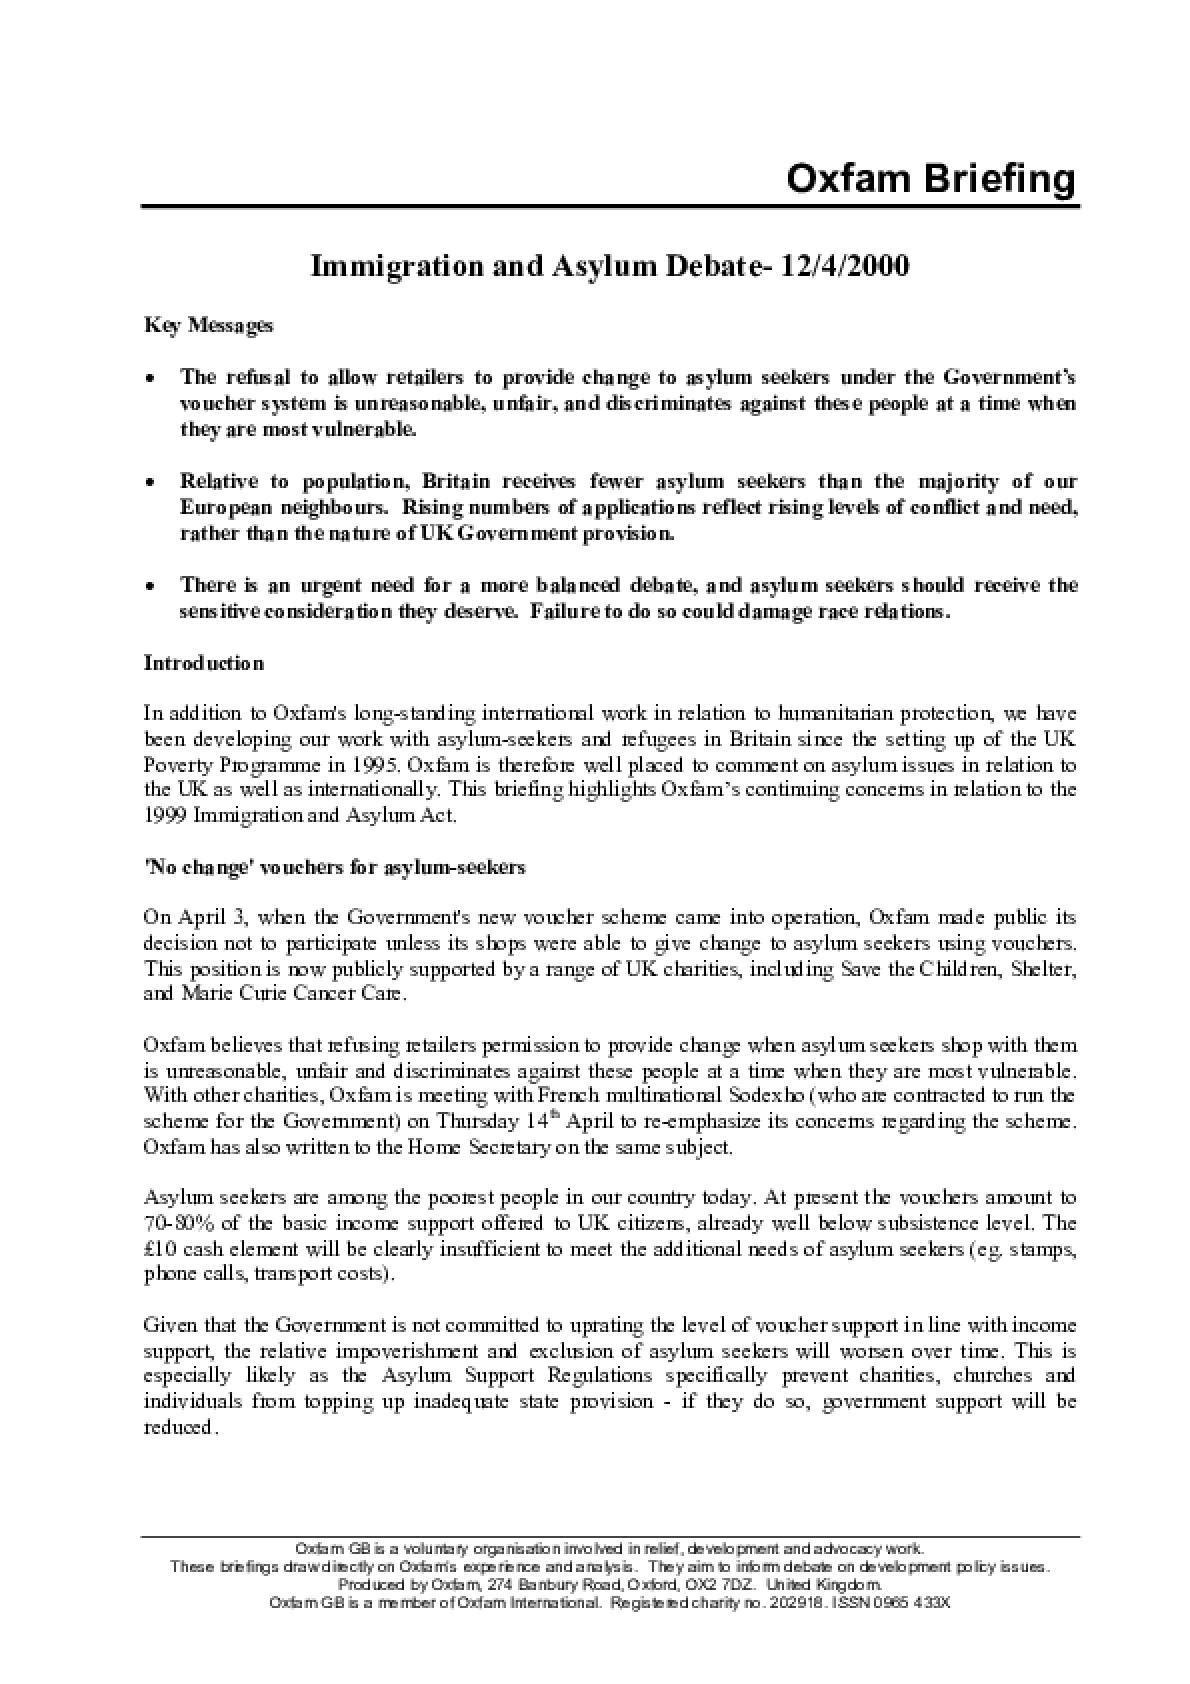 Immigration and Asylum Debate 12/4/2000